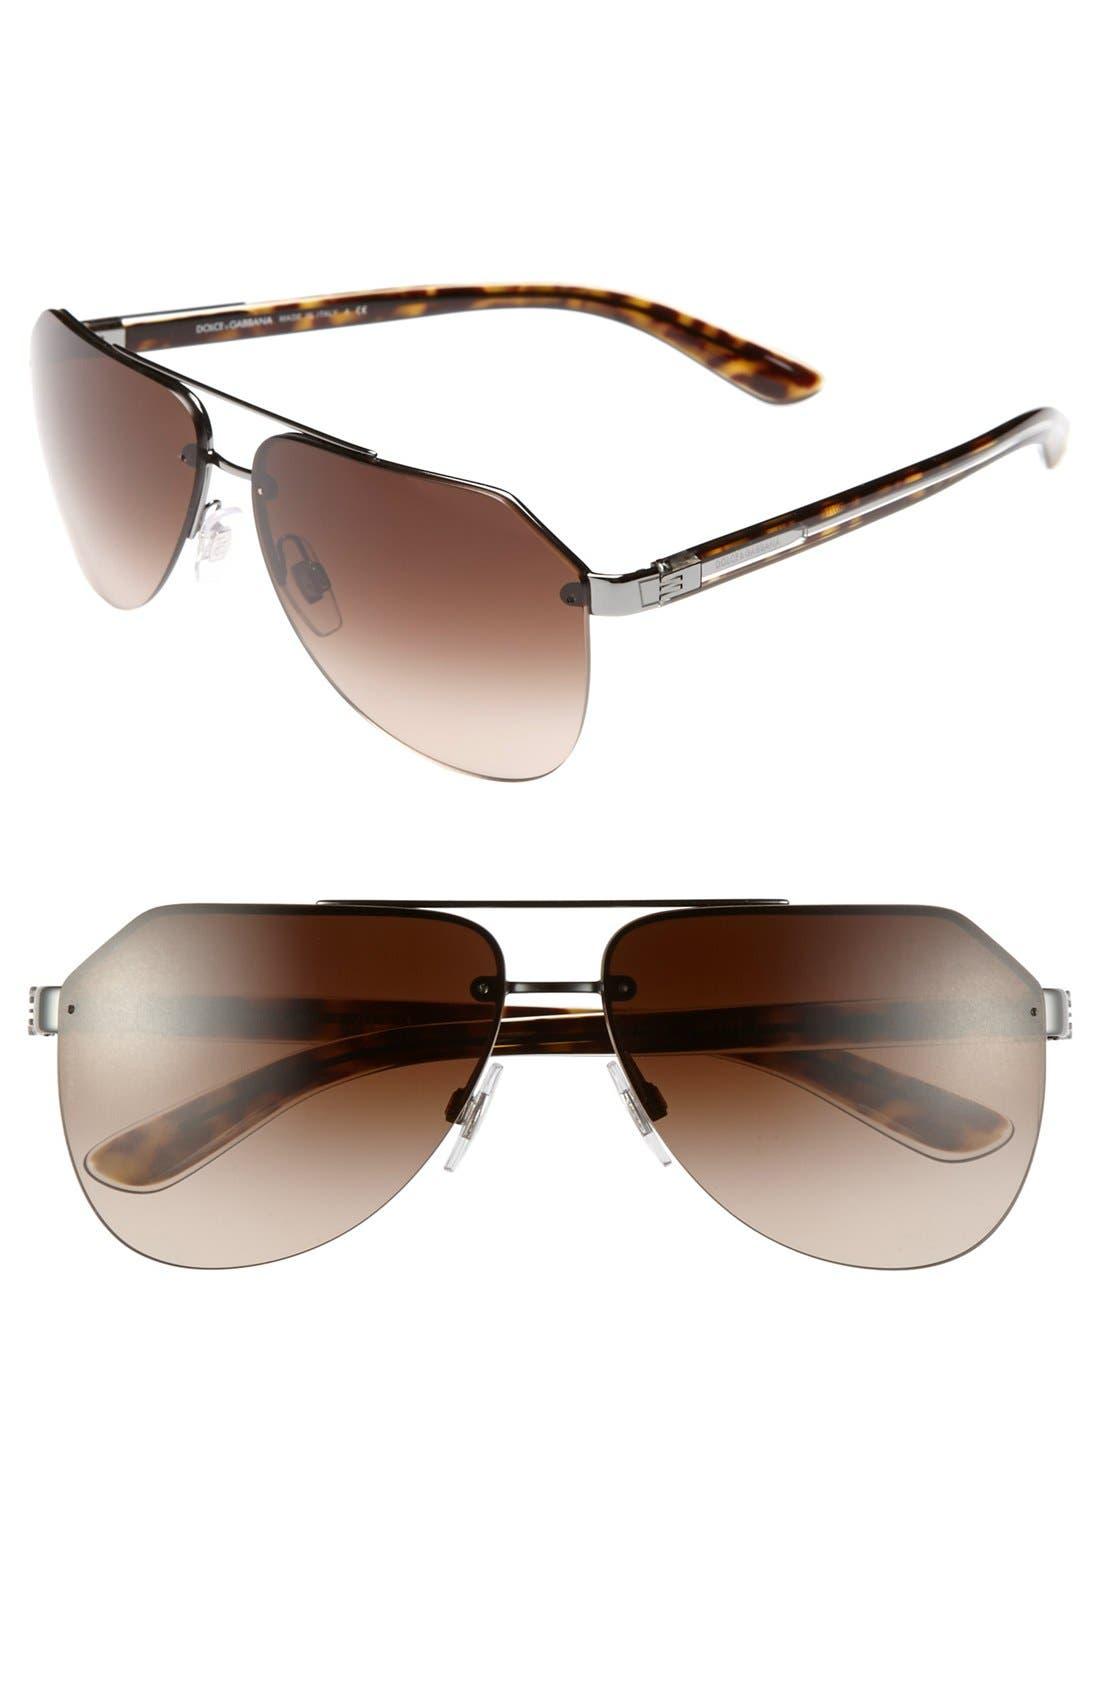 Main Image - Dolce&Gabbana 61mm Polarized Rimless Aviator Sunglasses